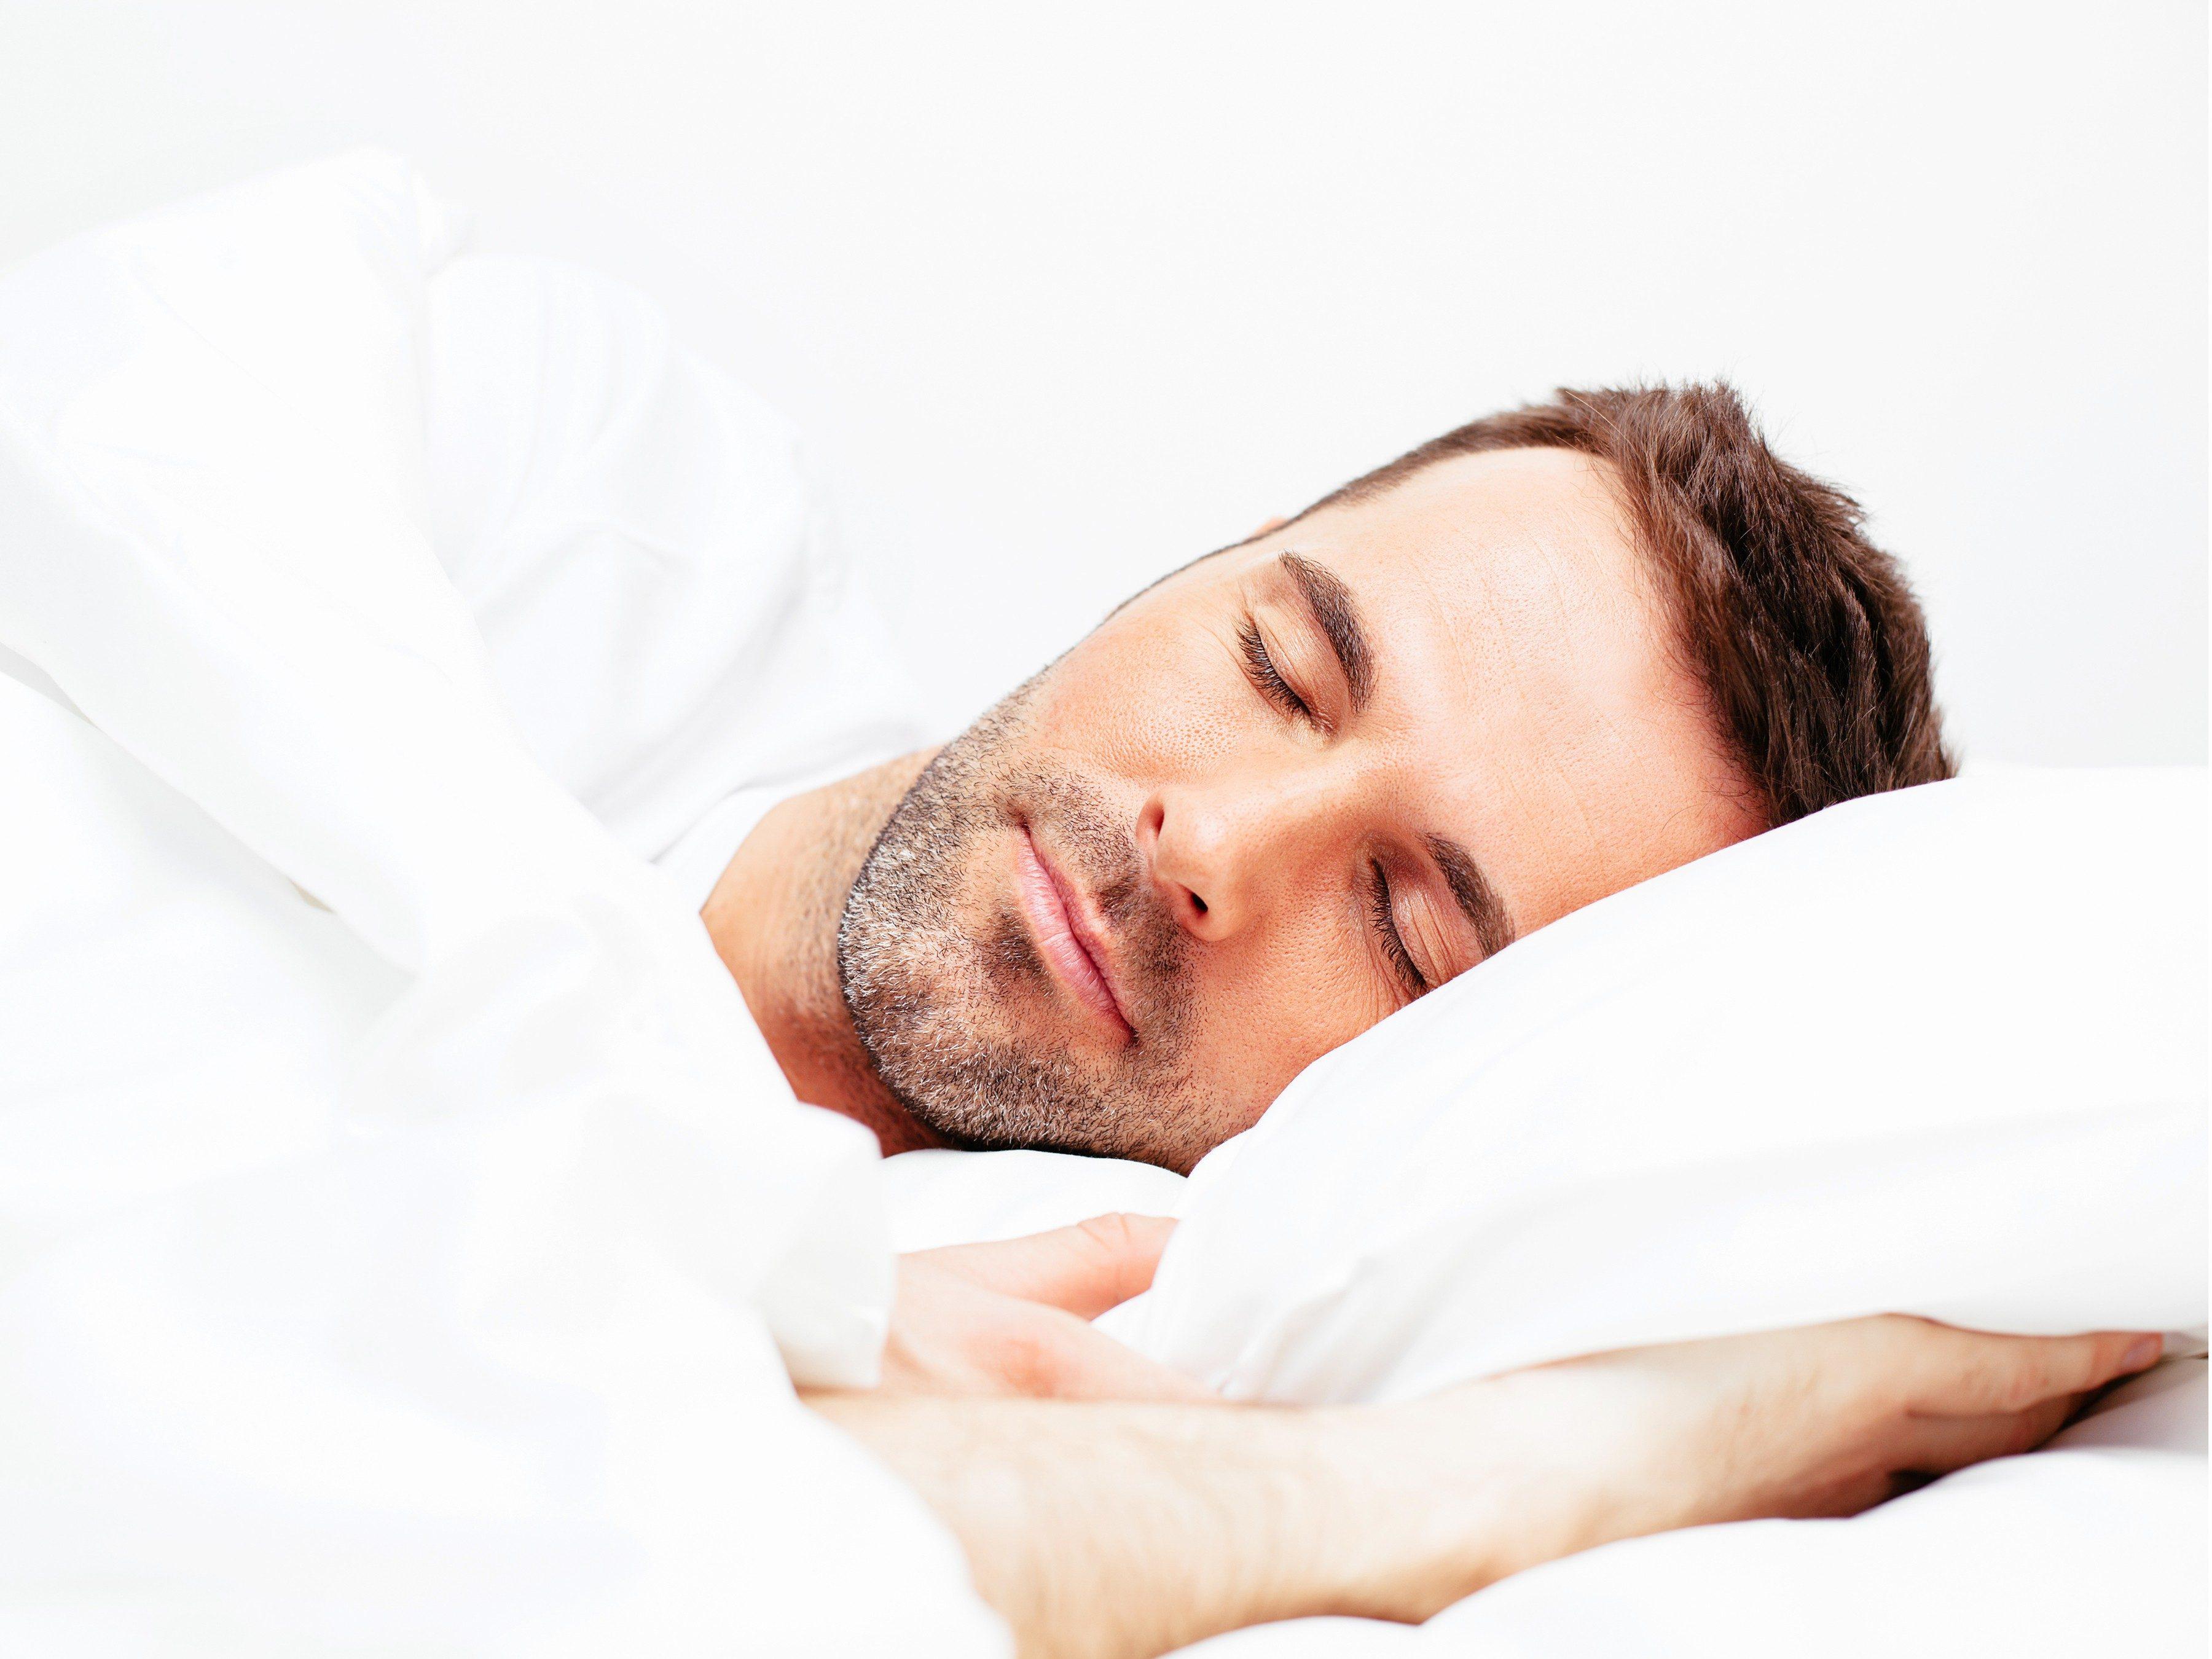 5 Healthy Habits that will Help You Sleep